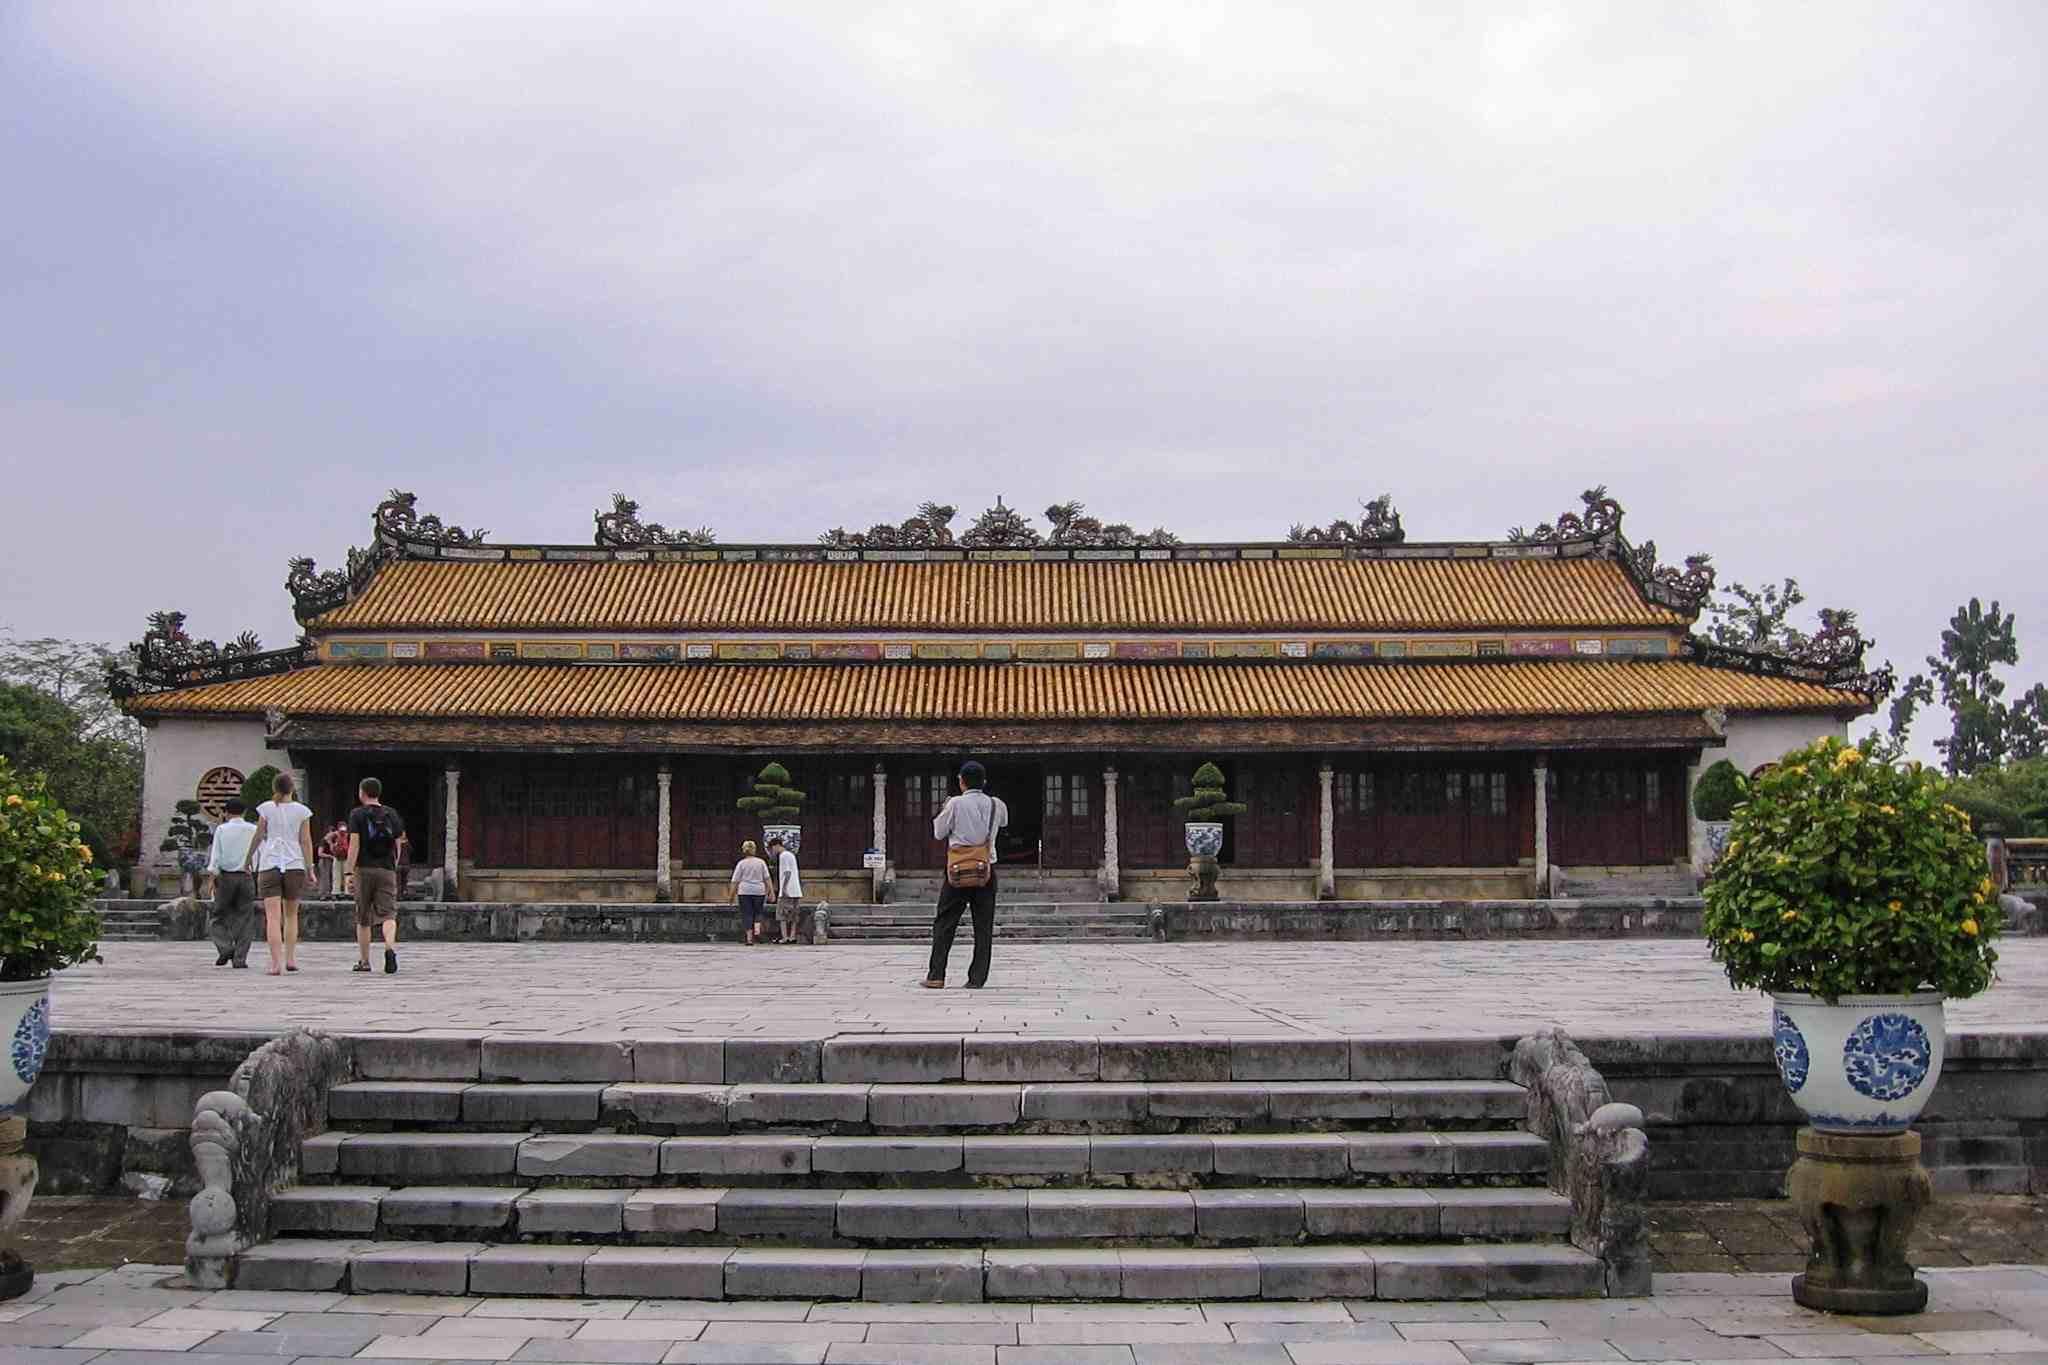 Palace of Supreme Harmony, Hue Citadel, Vietnam.